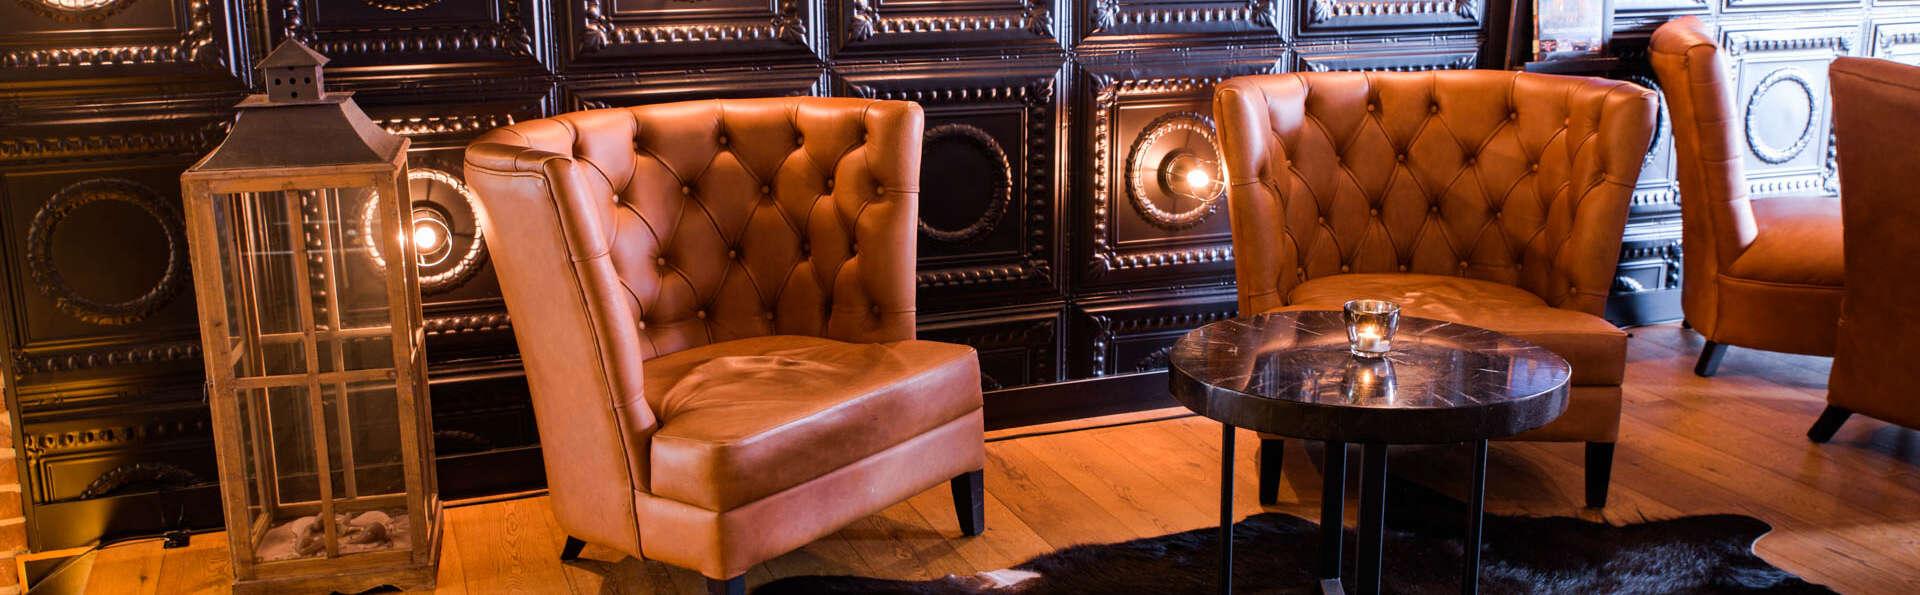 Apollo Hotel Papendrecht - EDIT_NEW_BAR.jpg